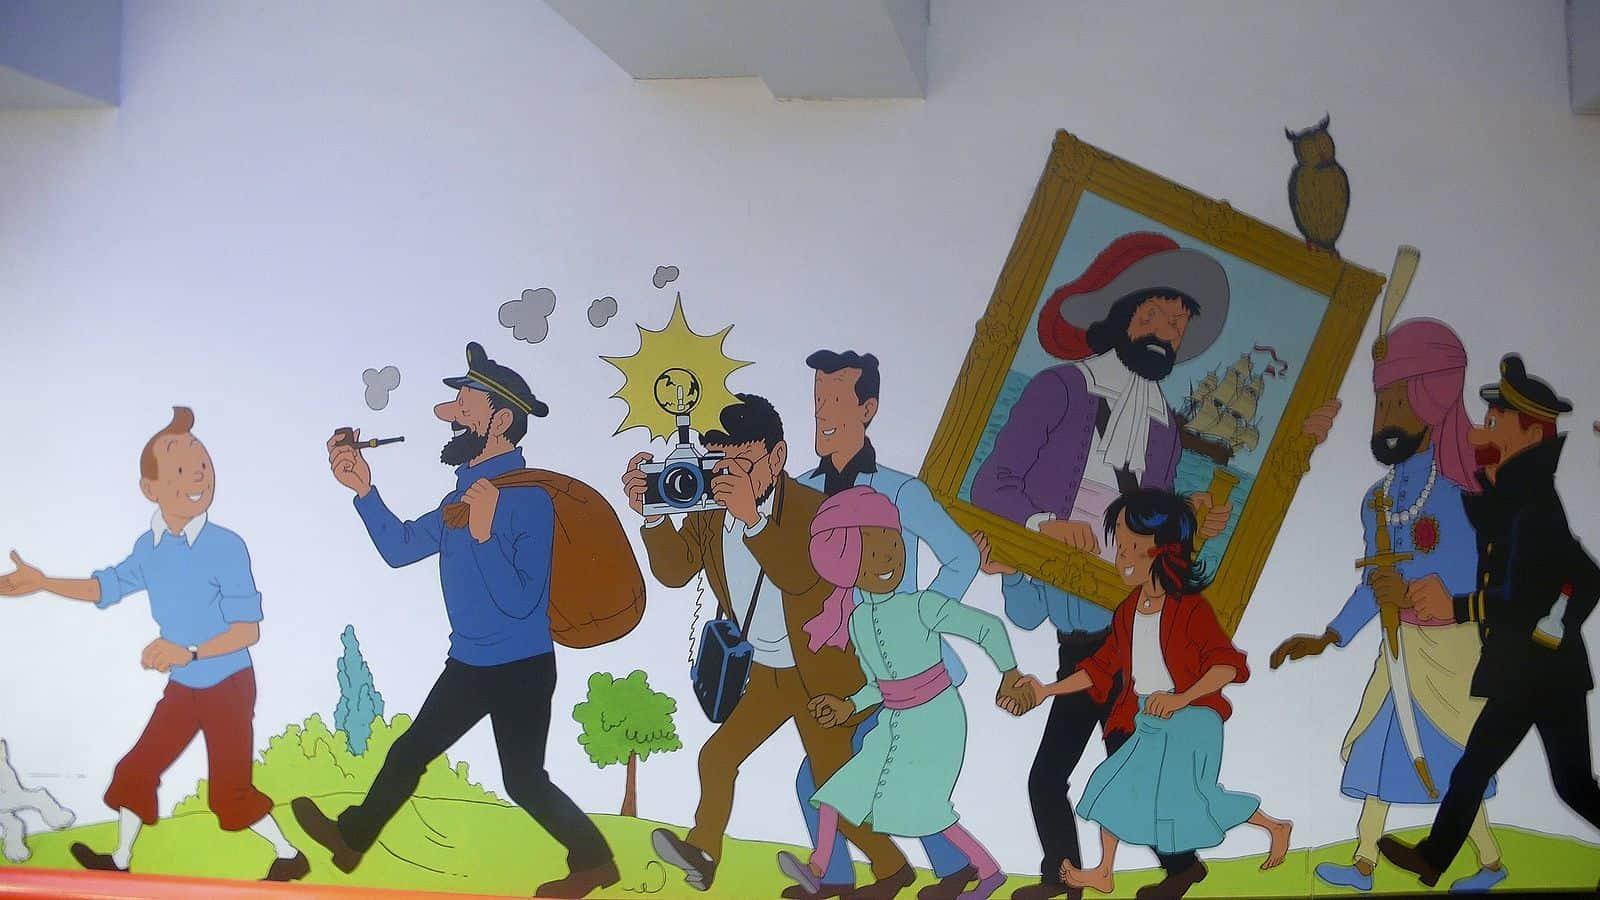 French comic Tintin